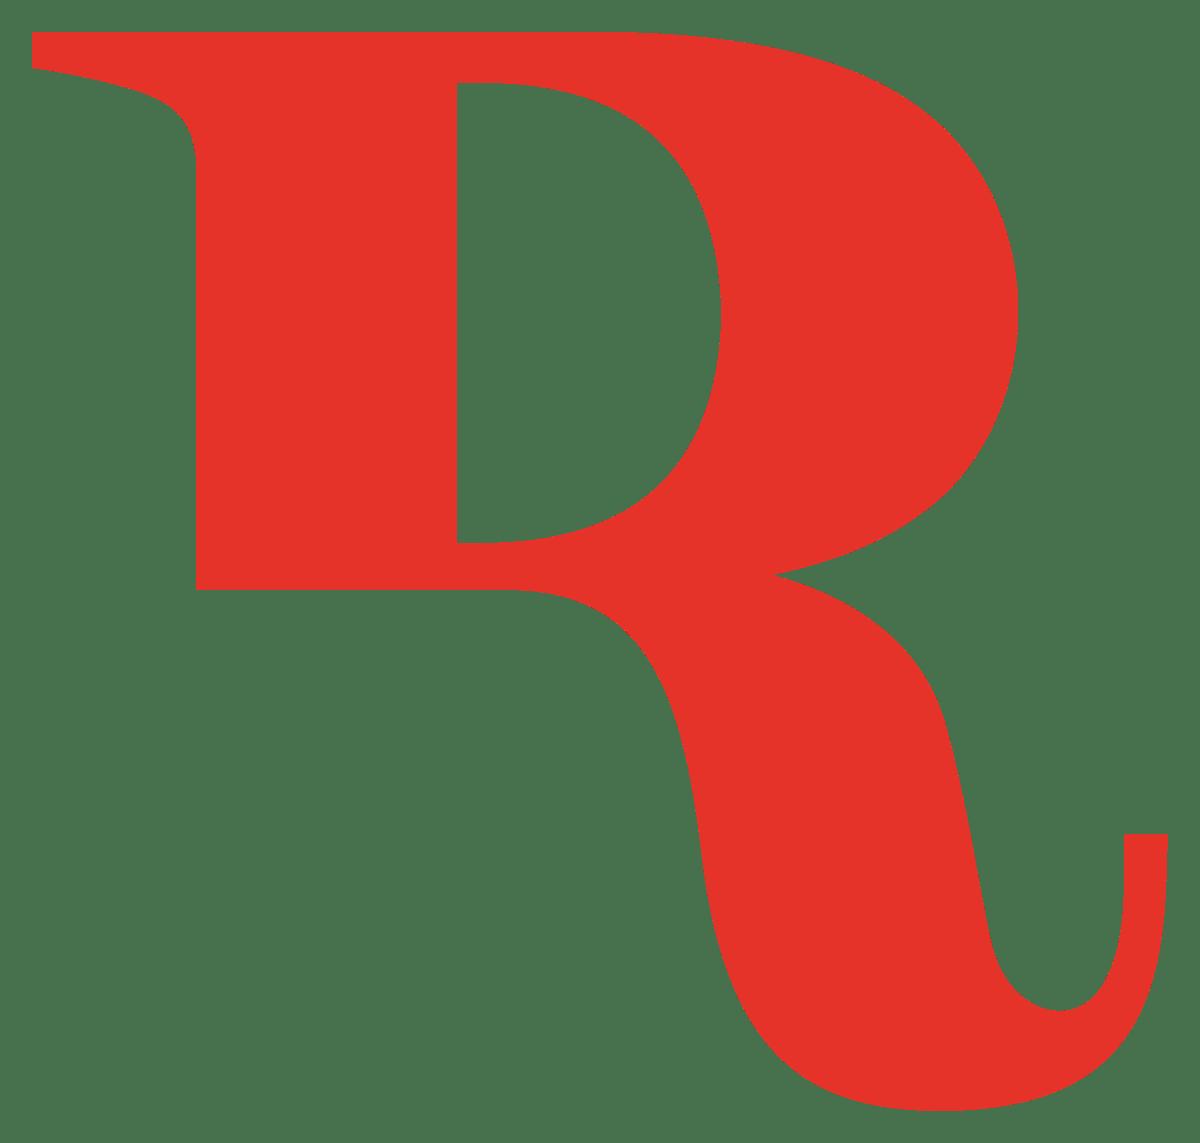 Zur Rose Group | Fundamentale Aktienanalyse